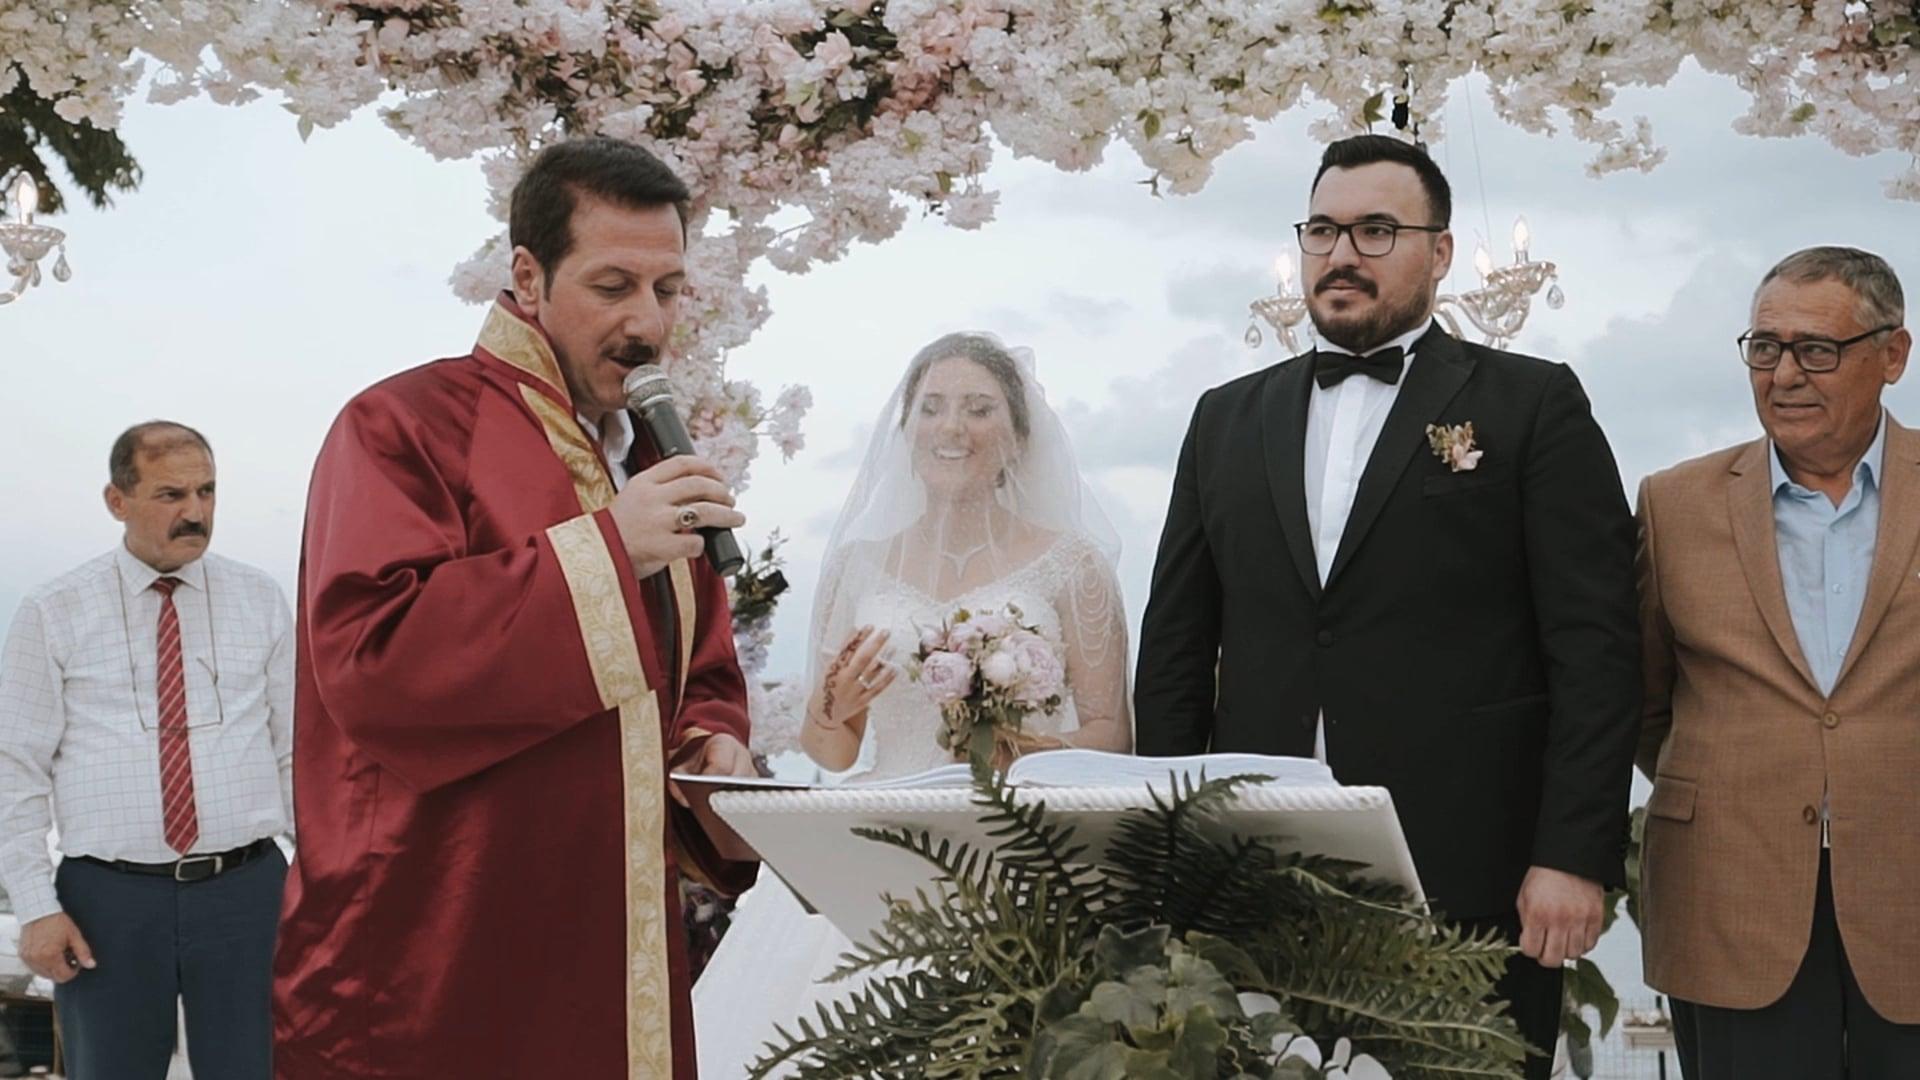 KEVSER + CAN / Wedding Video by Fotoğraf Dükkanı